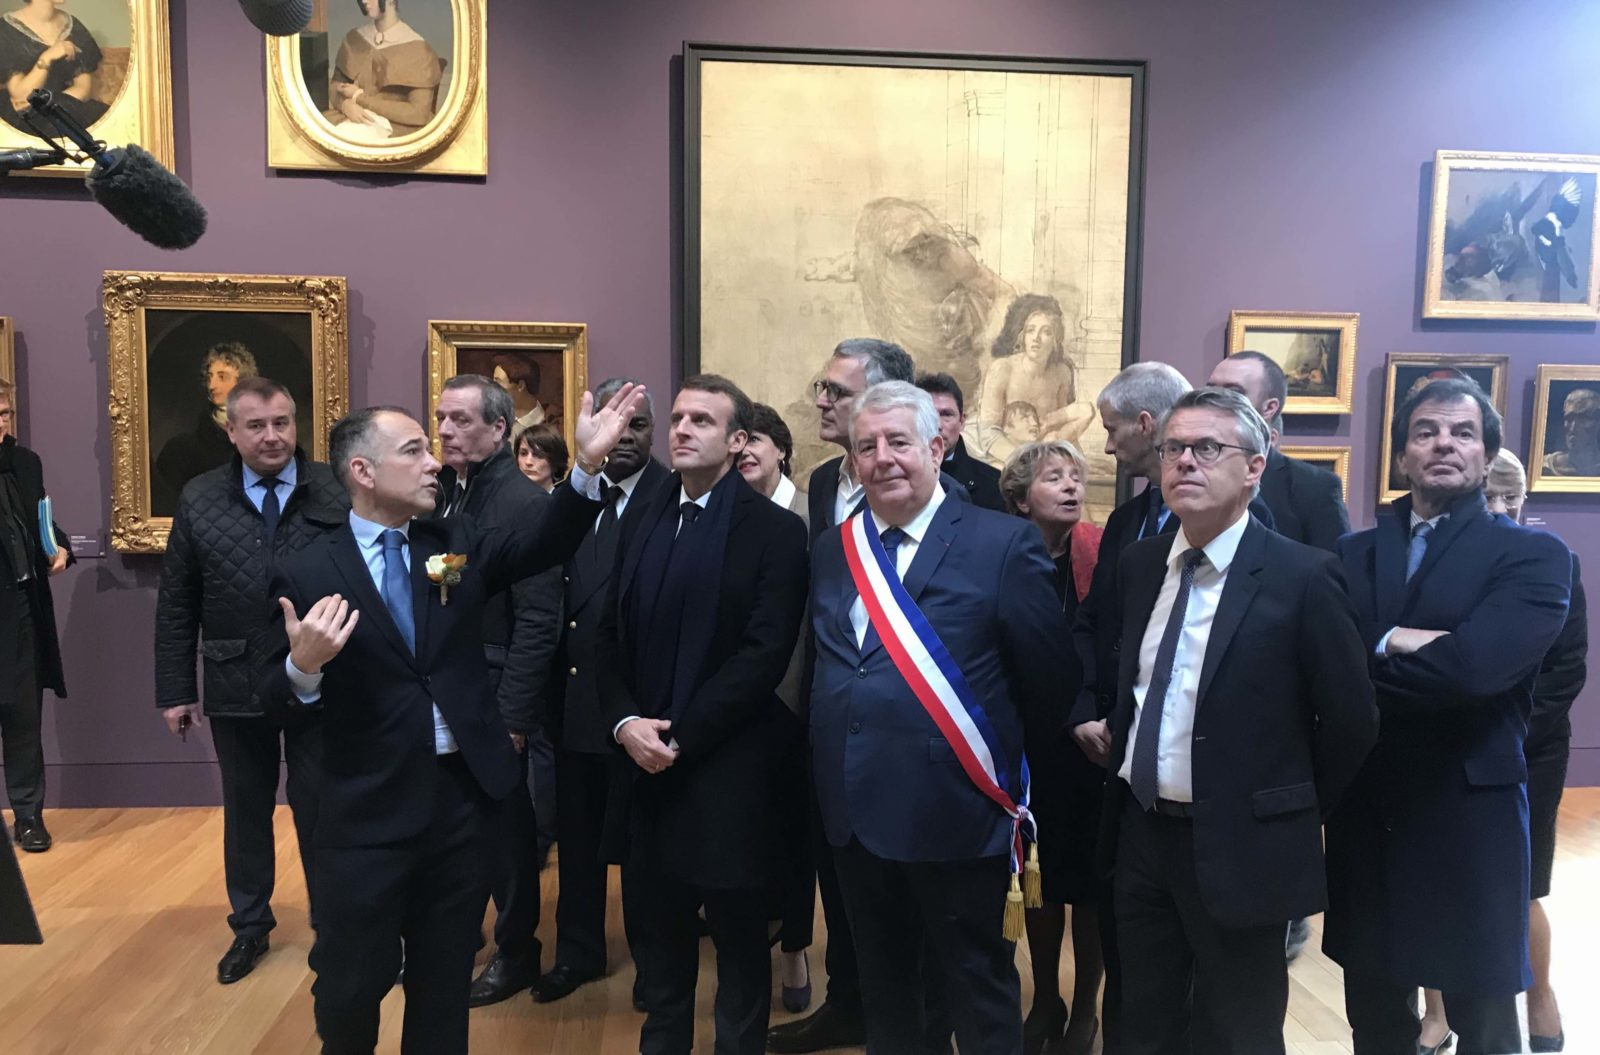 mbaa Besançon inauguration 2018 E. Macron JL Fousseret